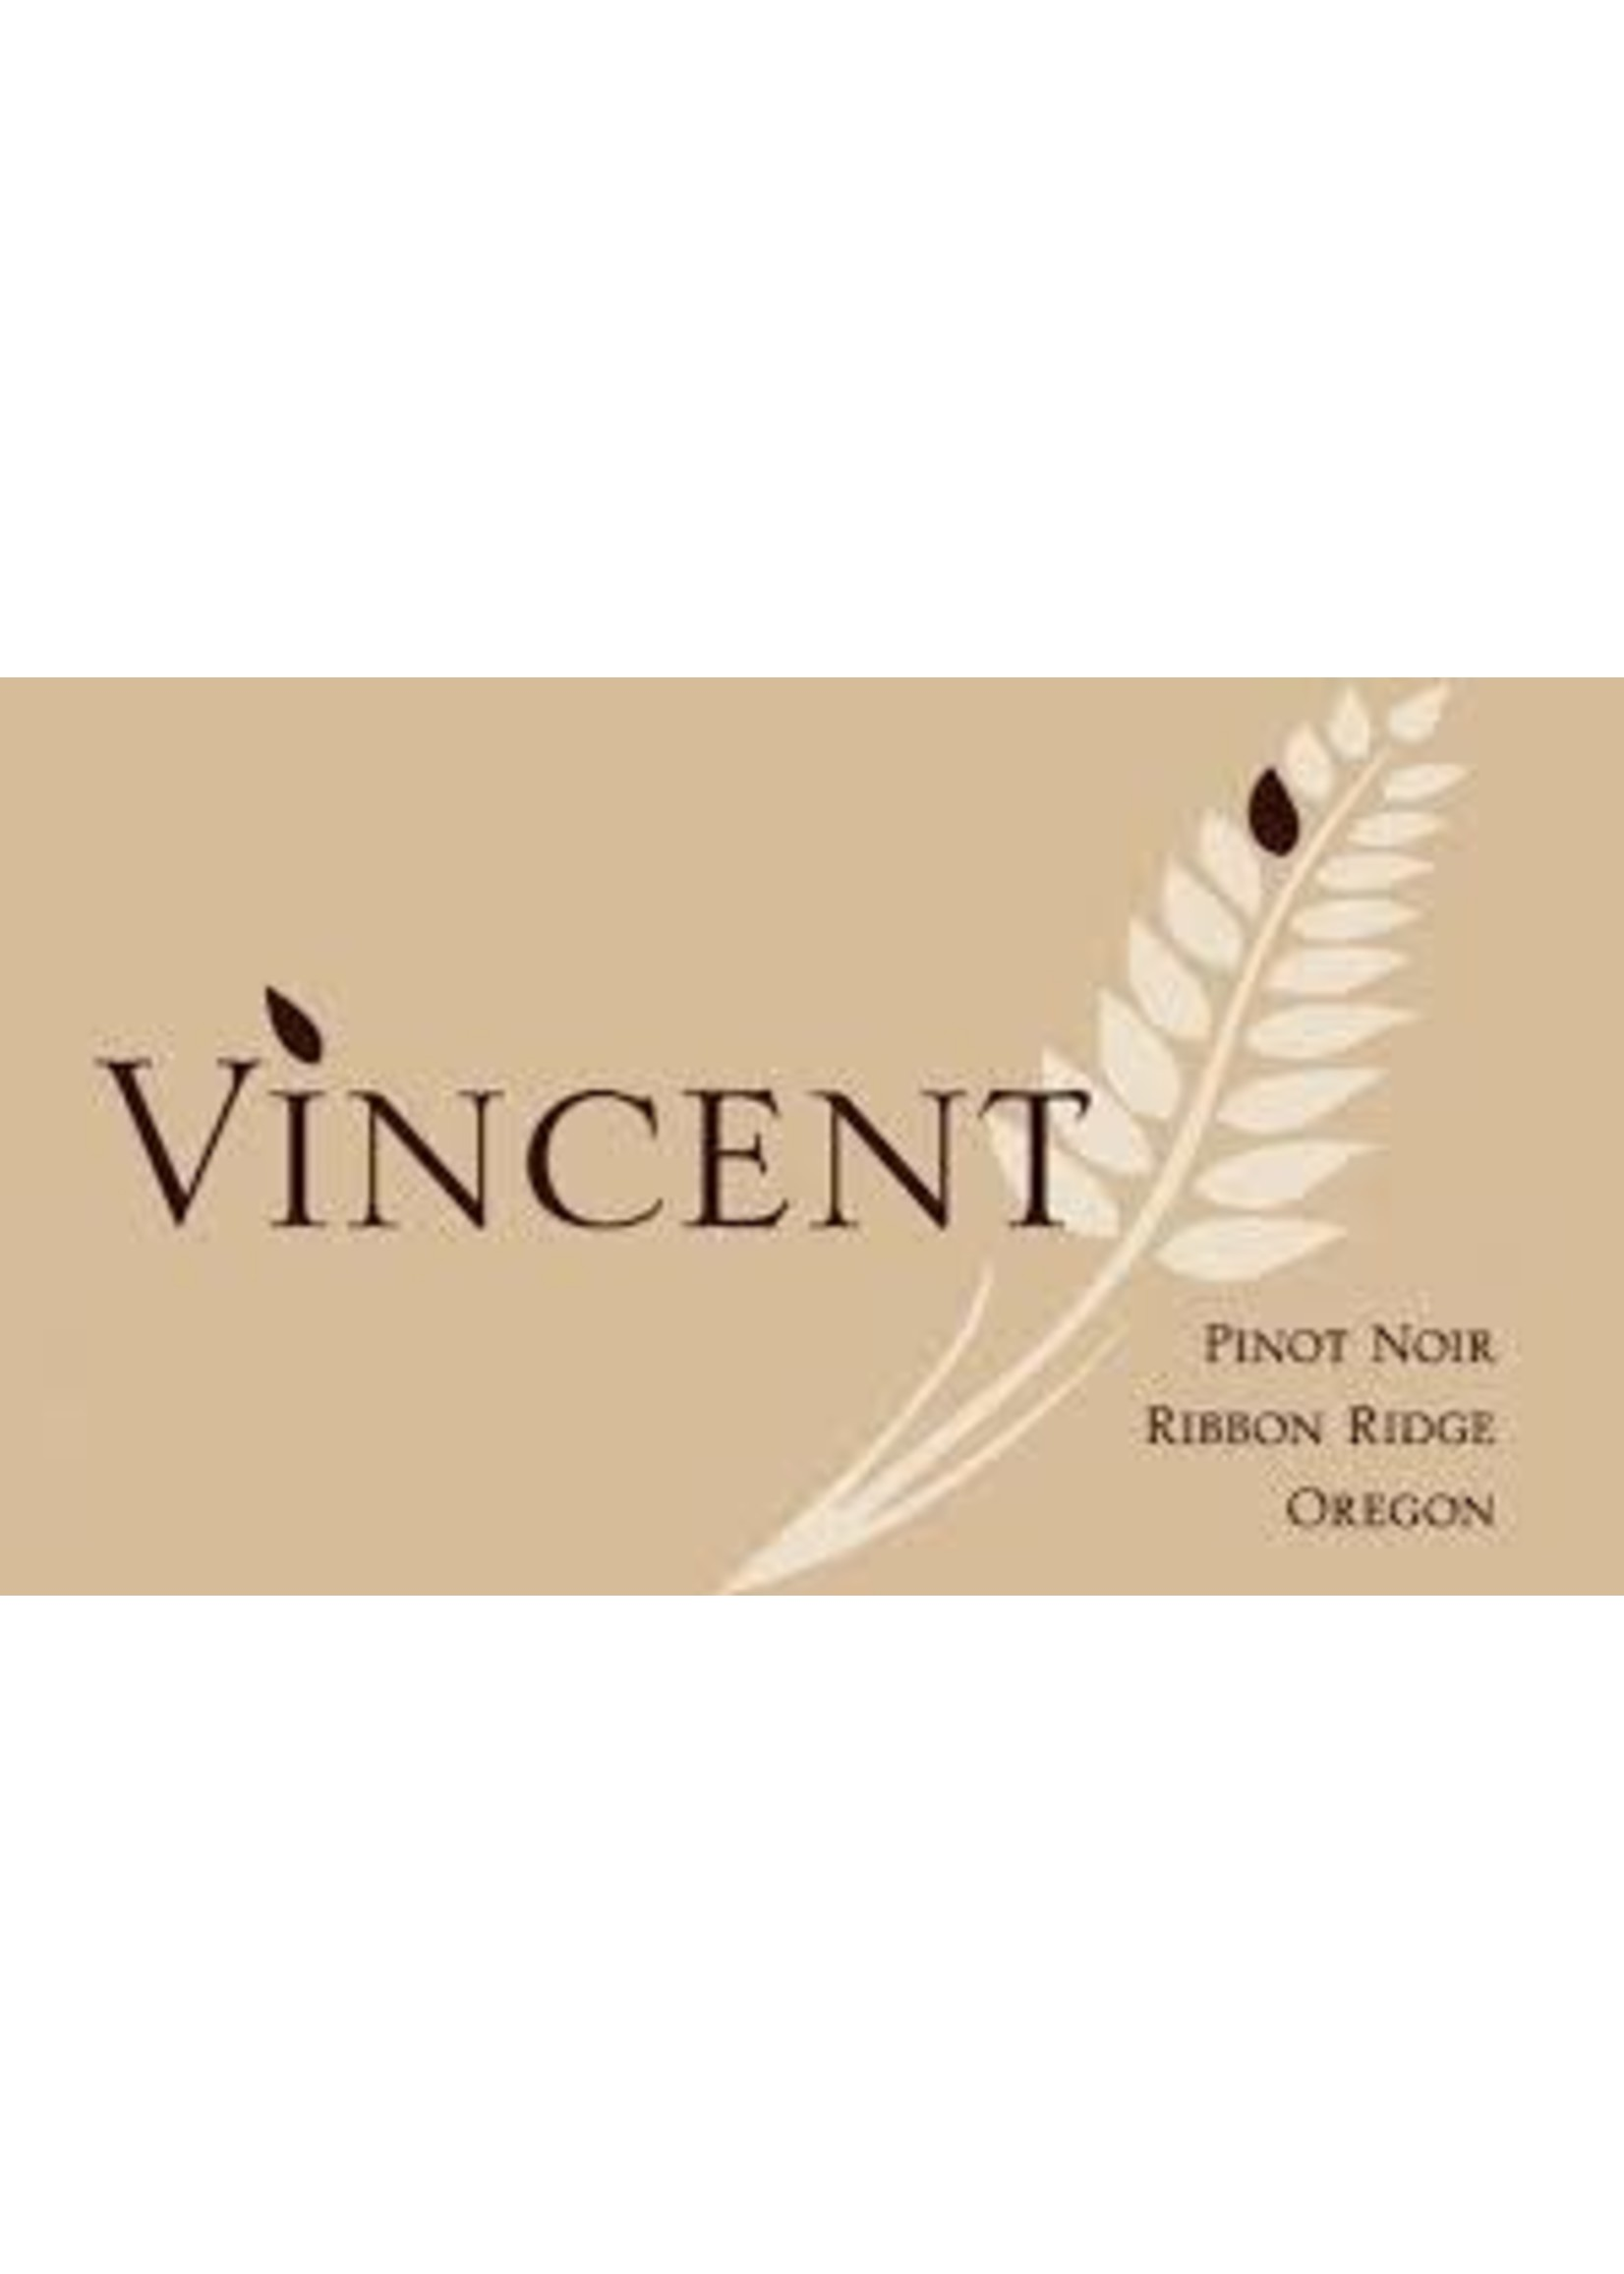 Vincent Pinot Noir 2017 Ribbon Ridge